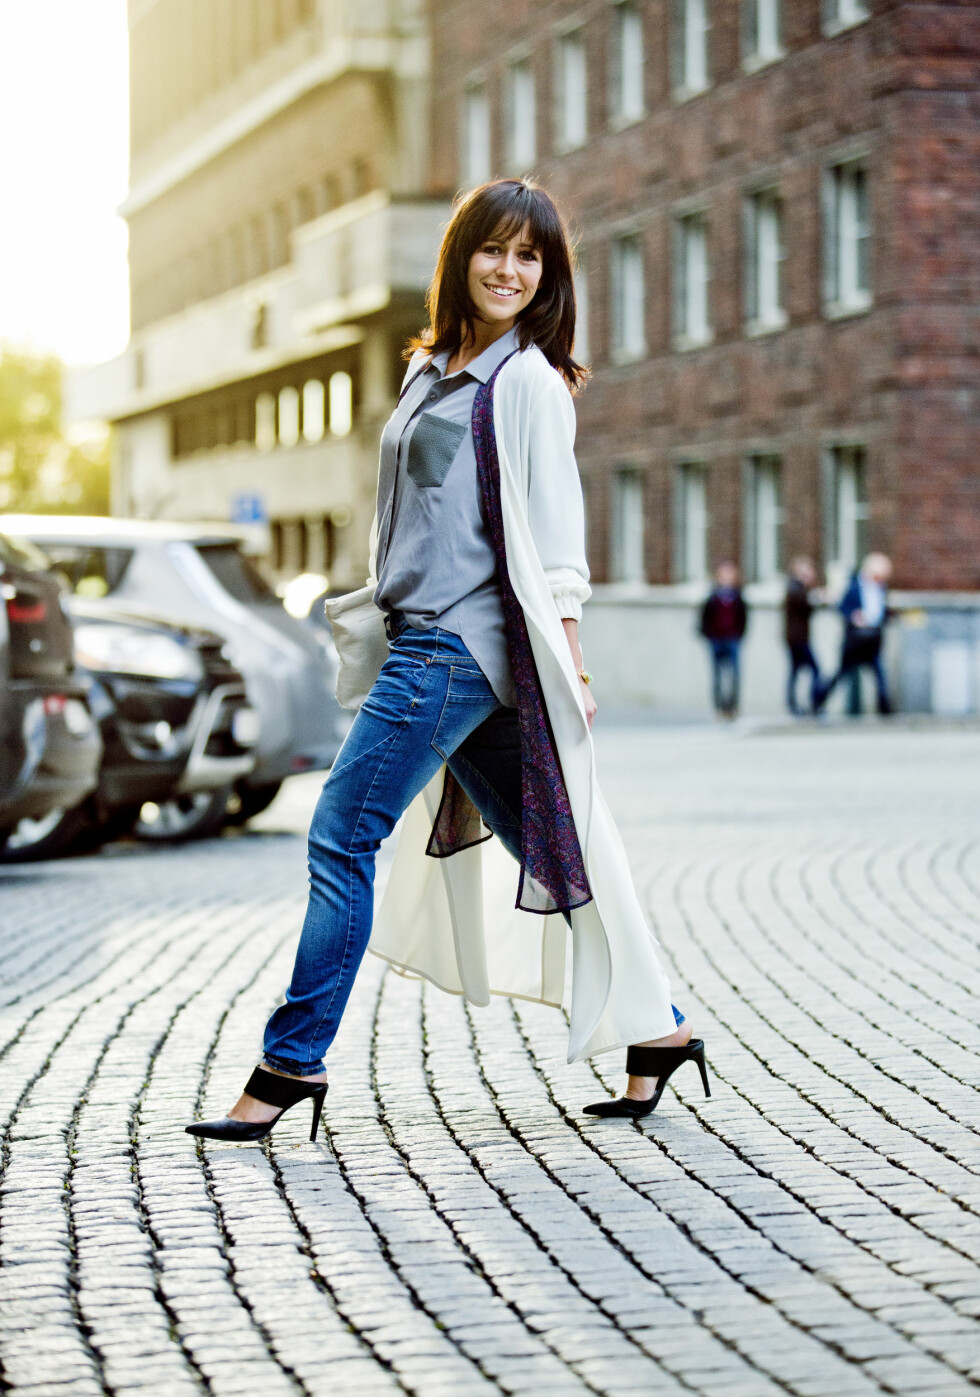 Line i skjorte (kr 1400, Riccovero), kimono (kr 300, Bik Bok), kåpe (kr 799, Lindex), jeans (kr 400, Gina Tricot), clutch (kr 1400, Samsøe & Samsøe) og sko (kr 2500, Apair).   Foto: Sara Johannessen / KK